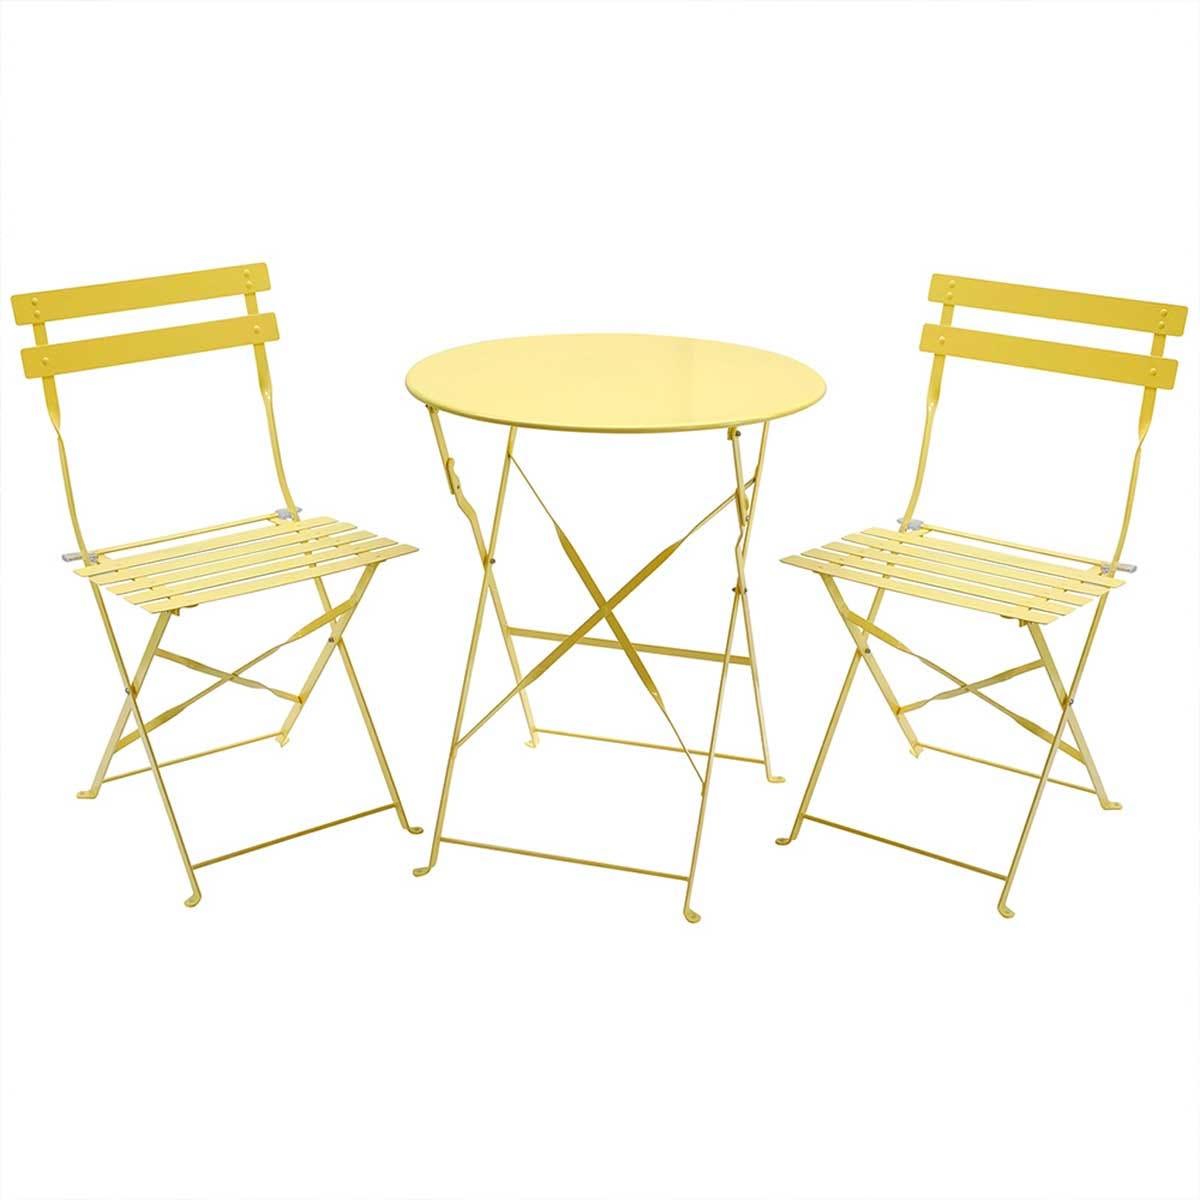 Charles Bentley Folding Metal Bistro Set - Yellow